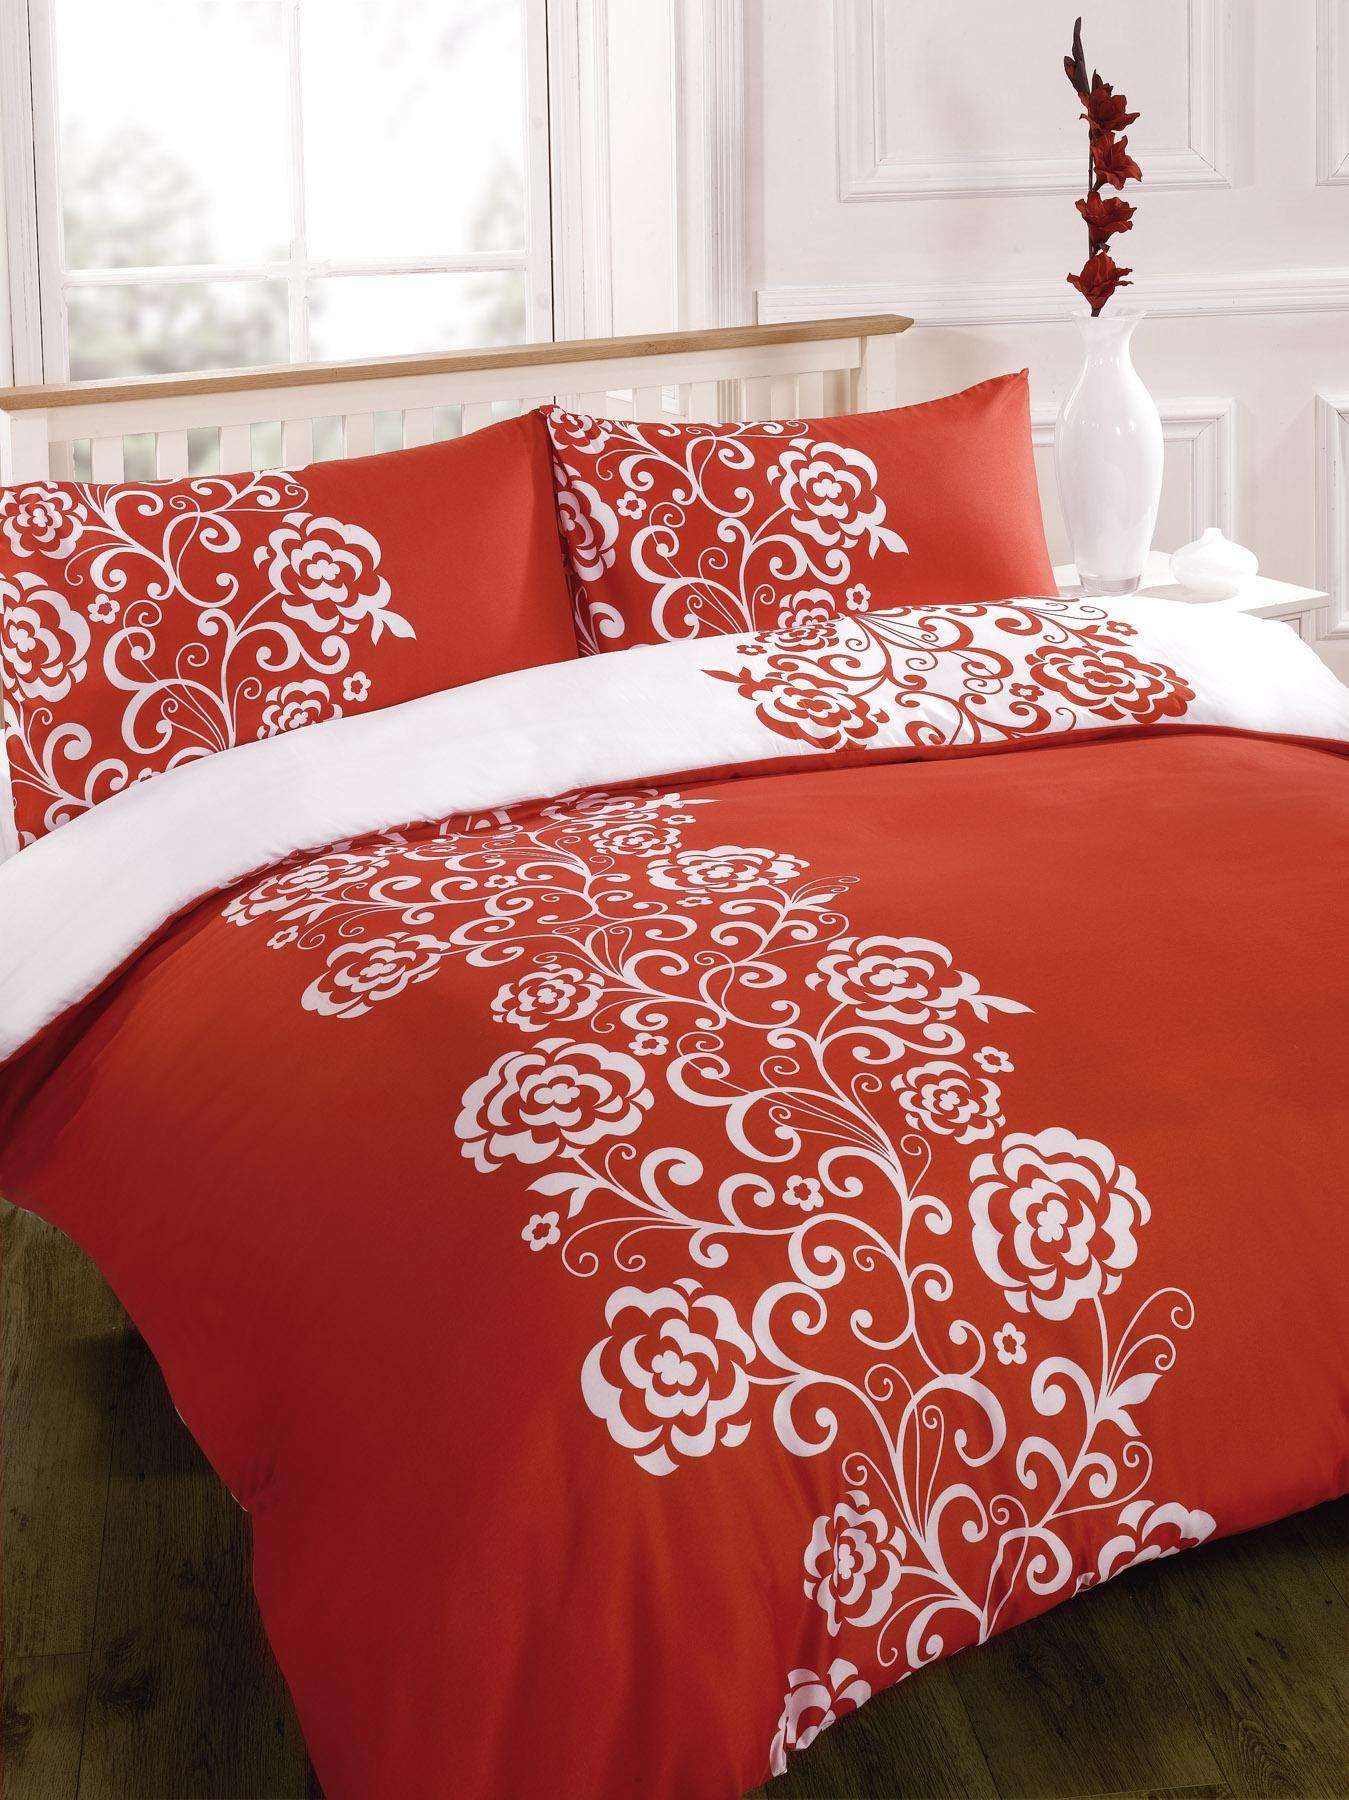 Duvet Quilt Cover Bedding Set Red Single Double King Kingsize Super King